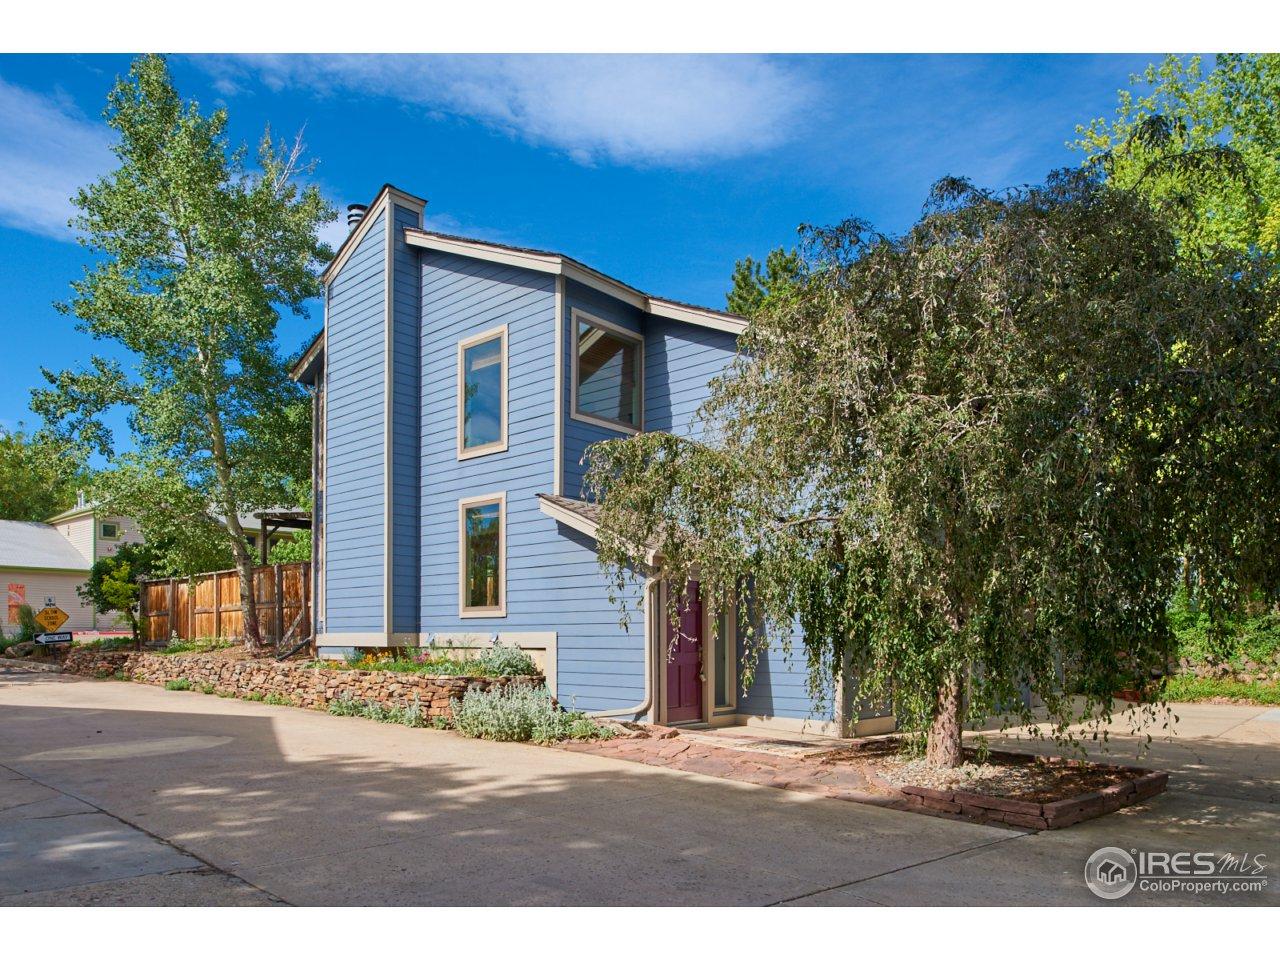 1130 Poplar Ave, Boulder, CO 80304